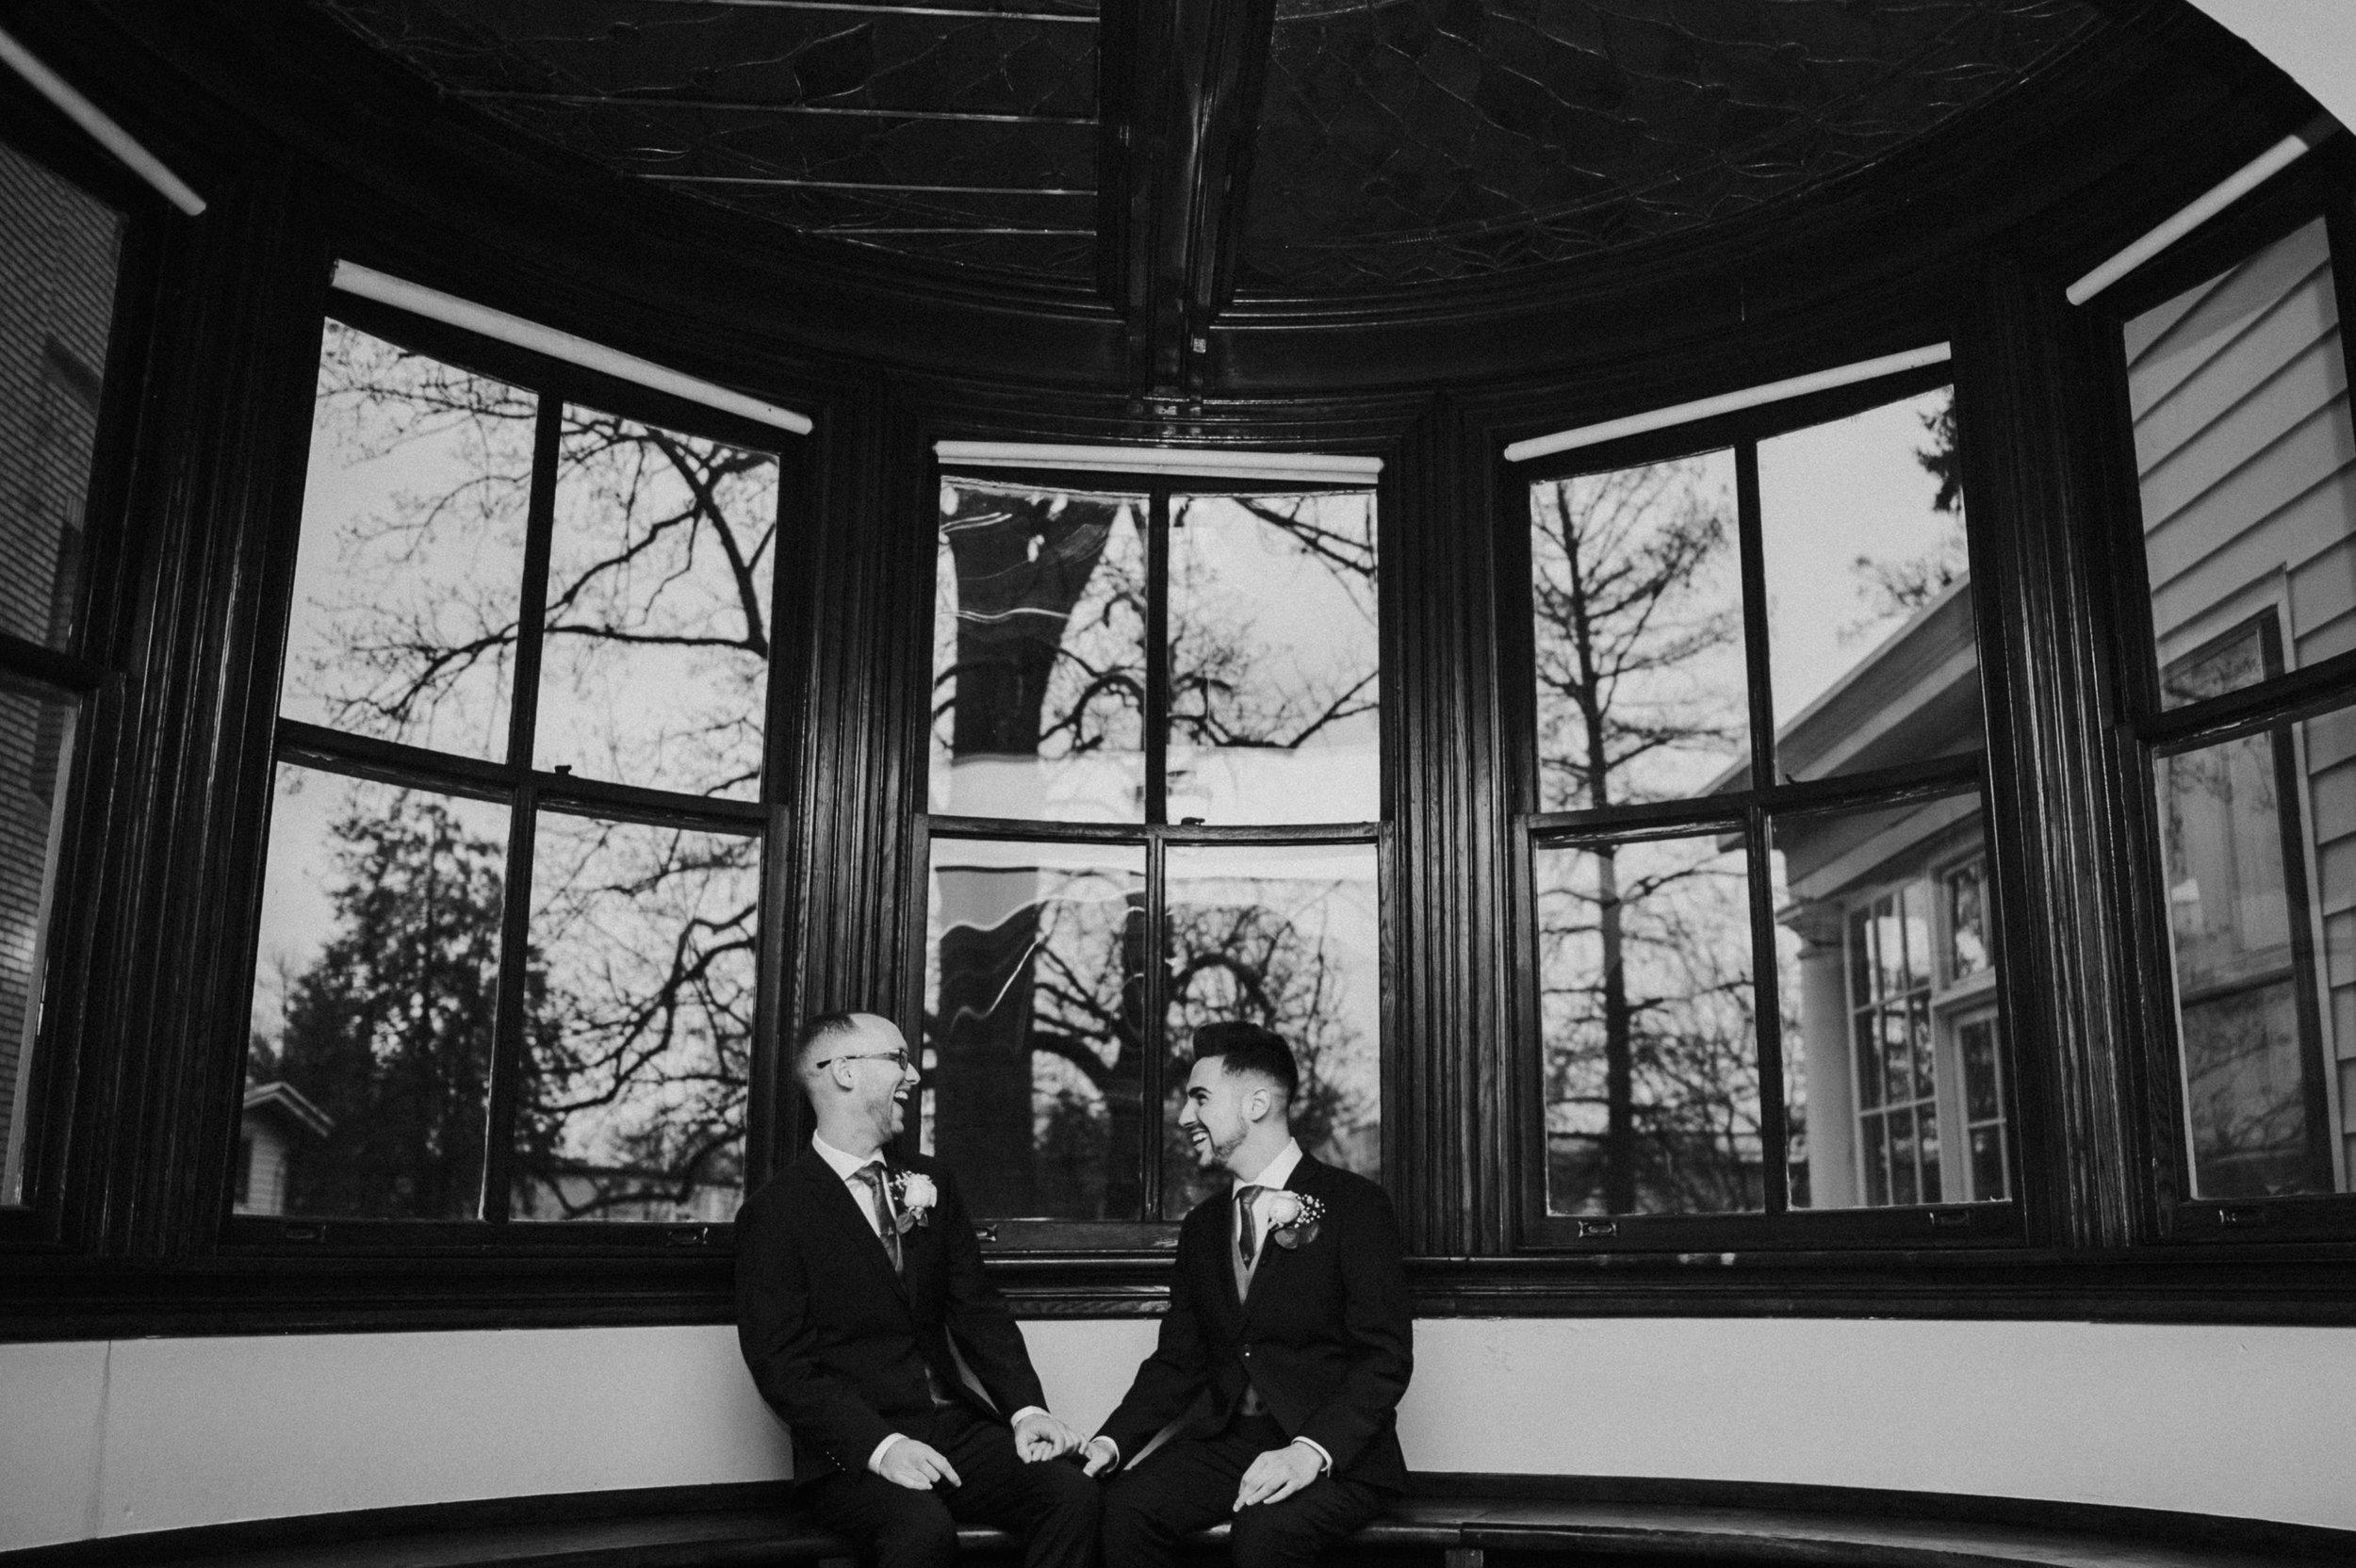 Collingswood-Grand-Ballroom-Wedding-Chris-and-Kevin_-330.jpg